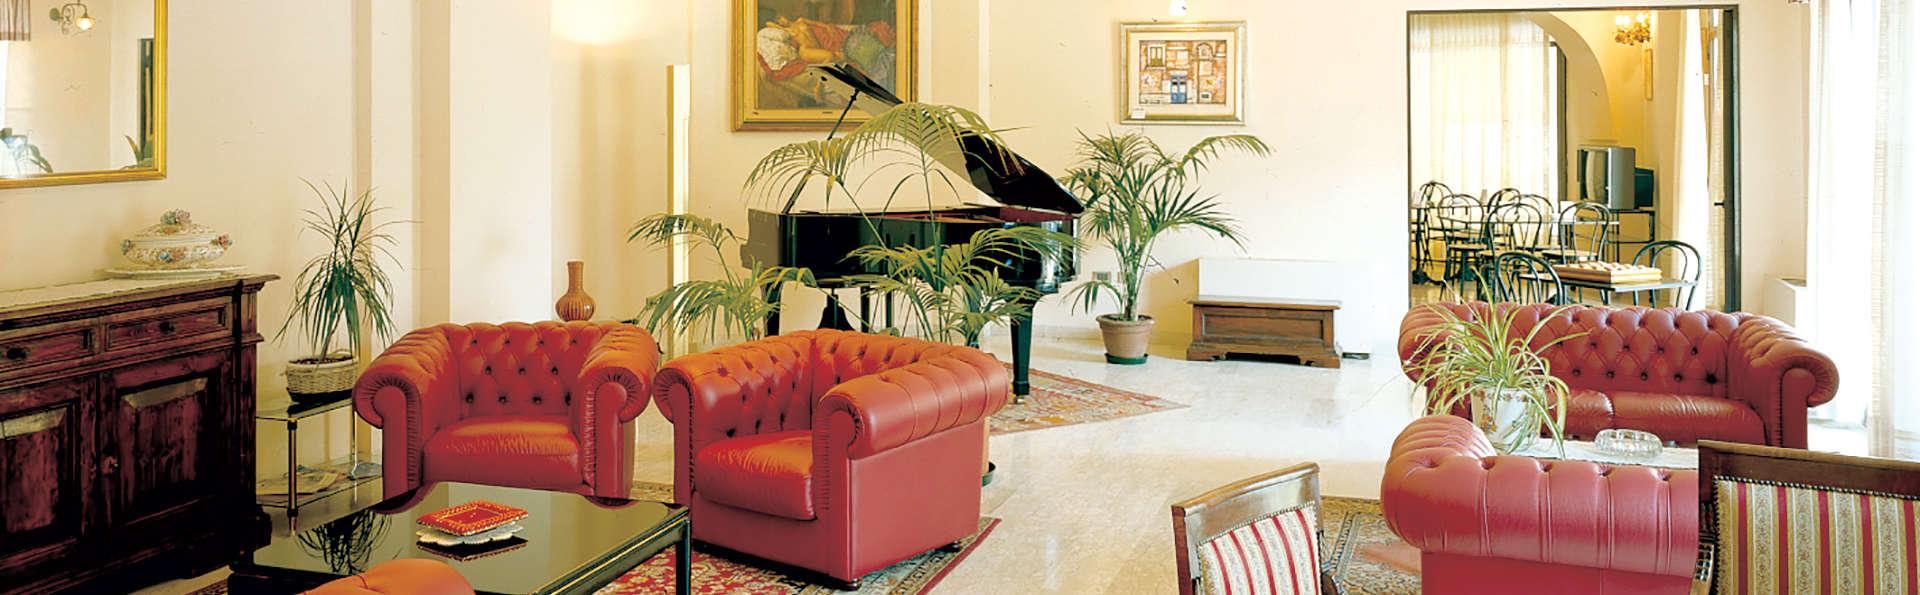 Hotel Des Bains - Edit_Lounge.jpg